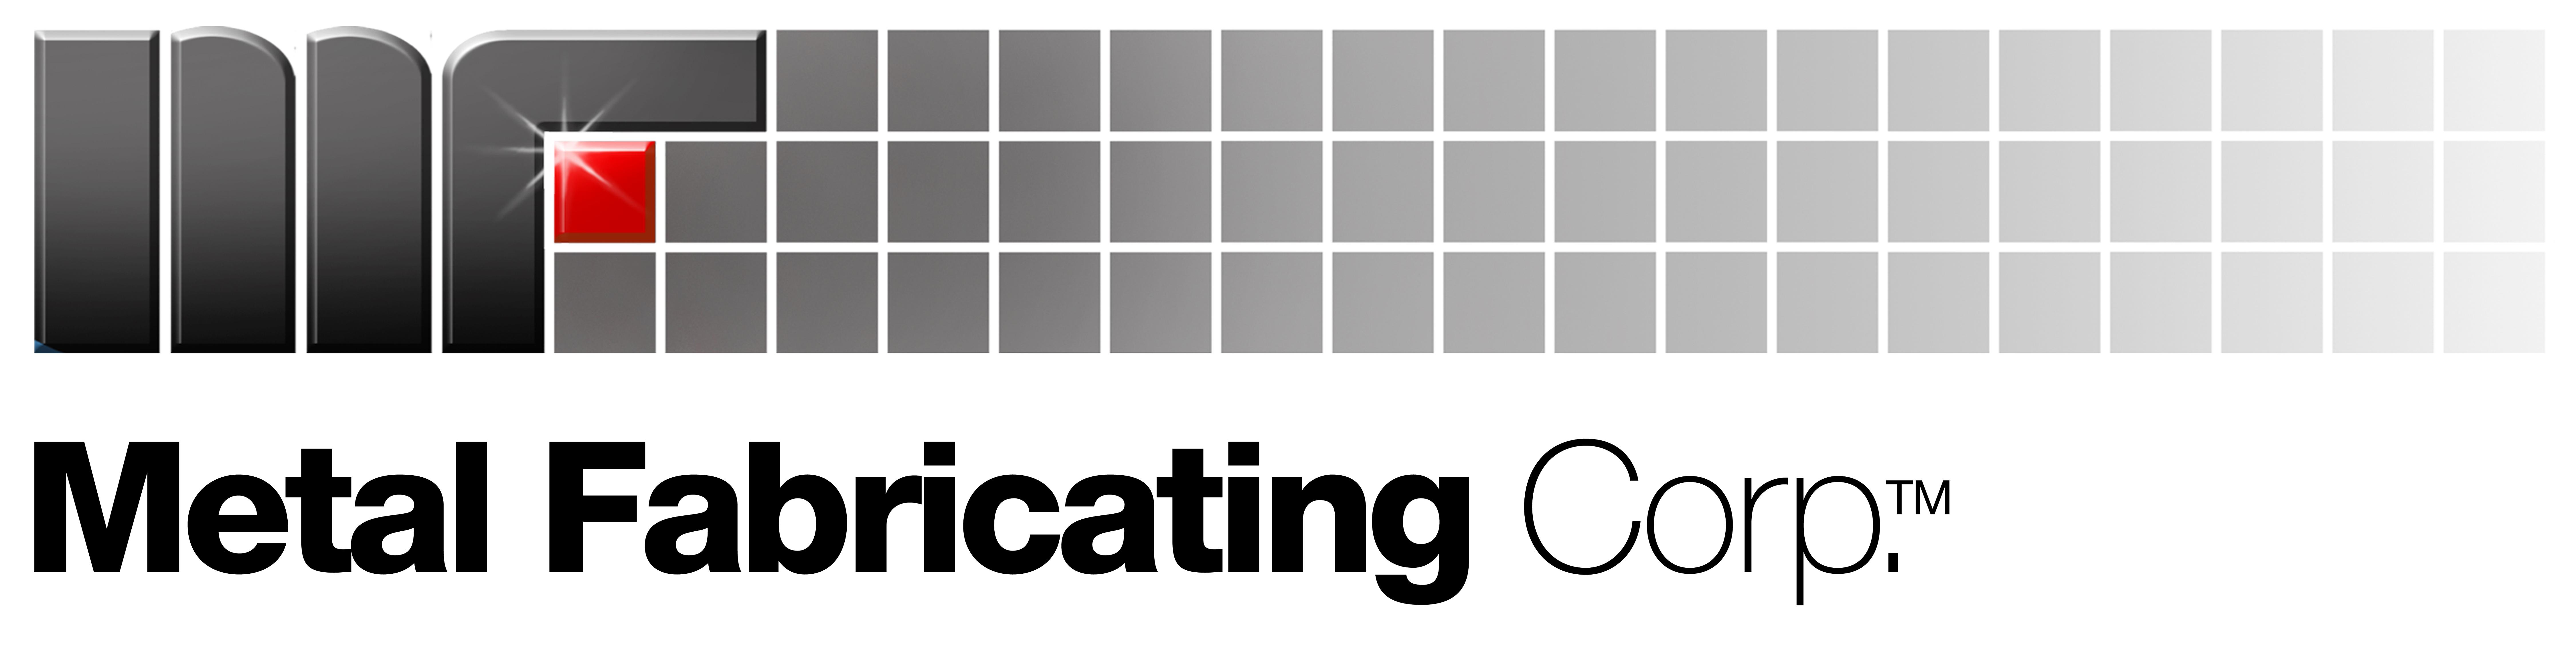 Metal Fabricating Corp.